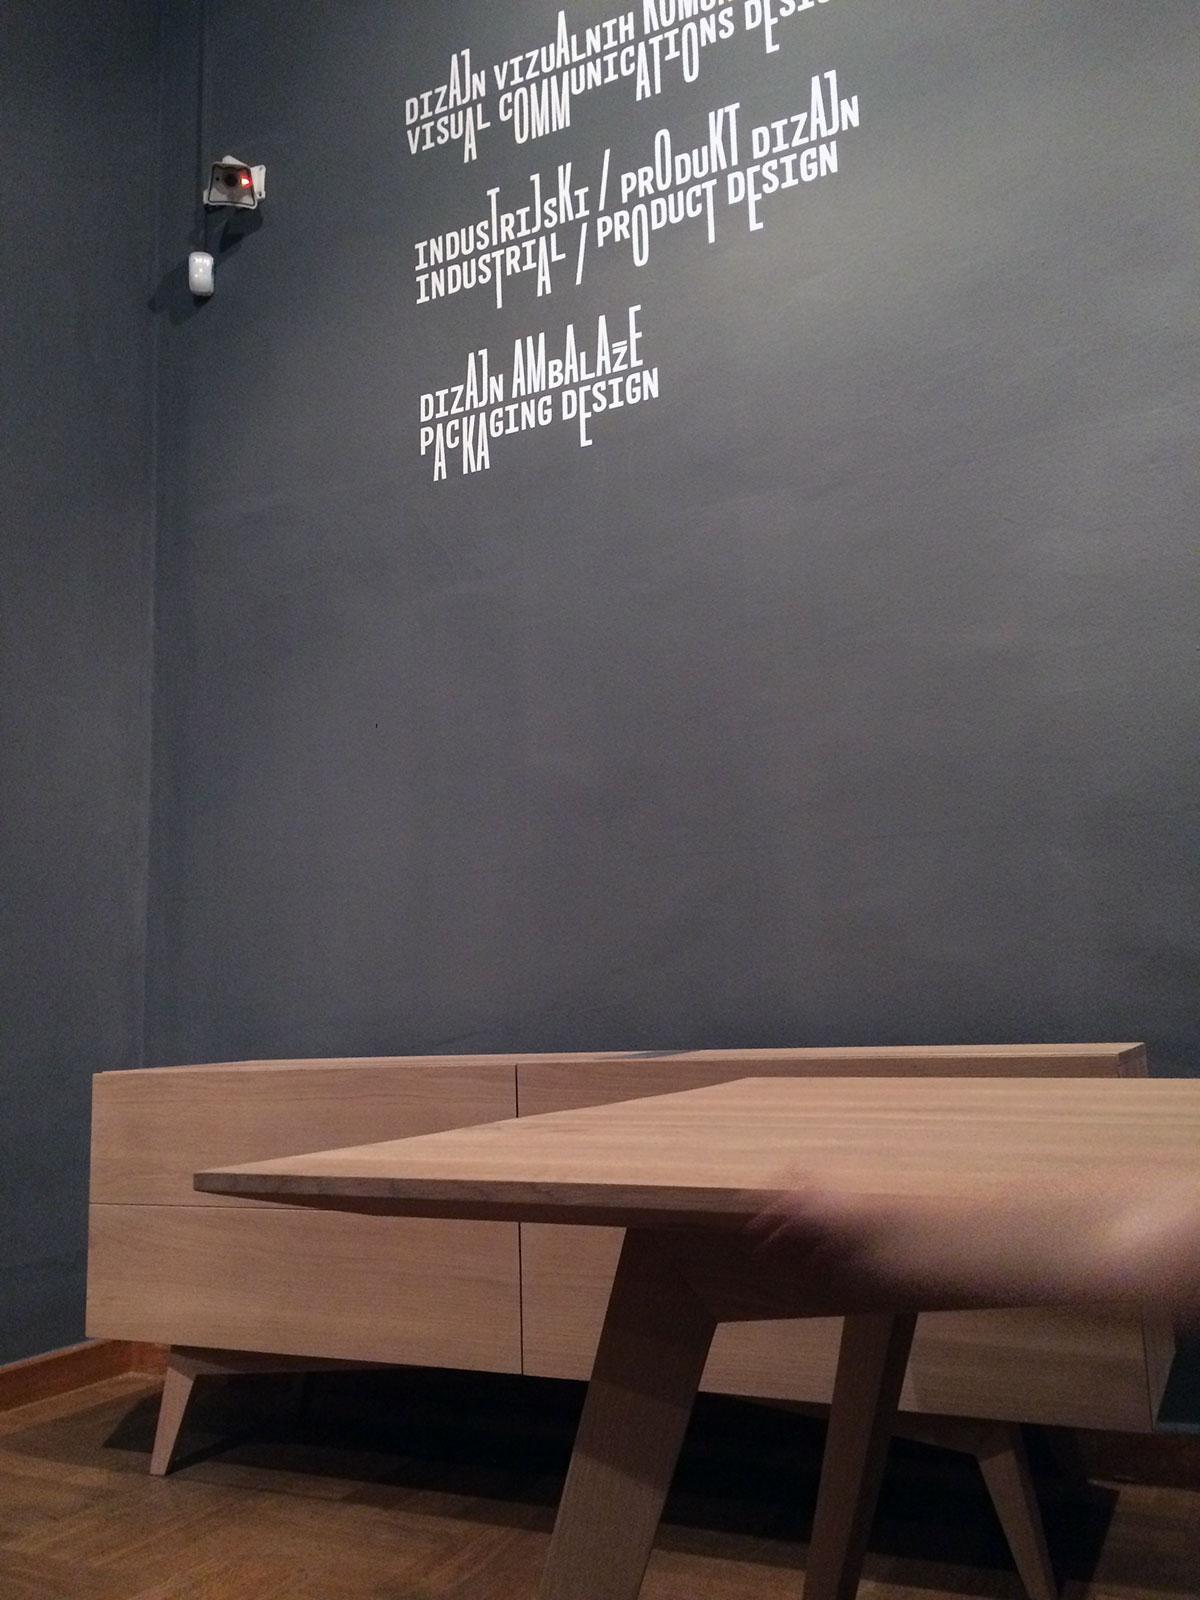 masavukmanovic.com - croatian design biennale 1516 - x line of eco furniture